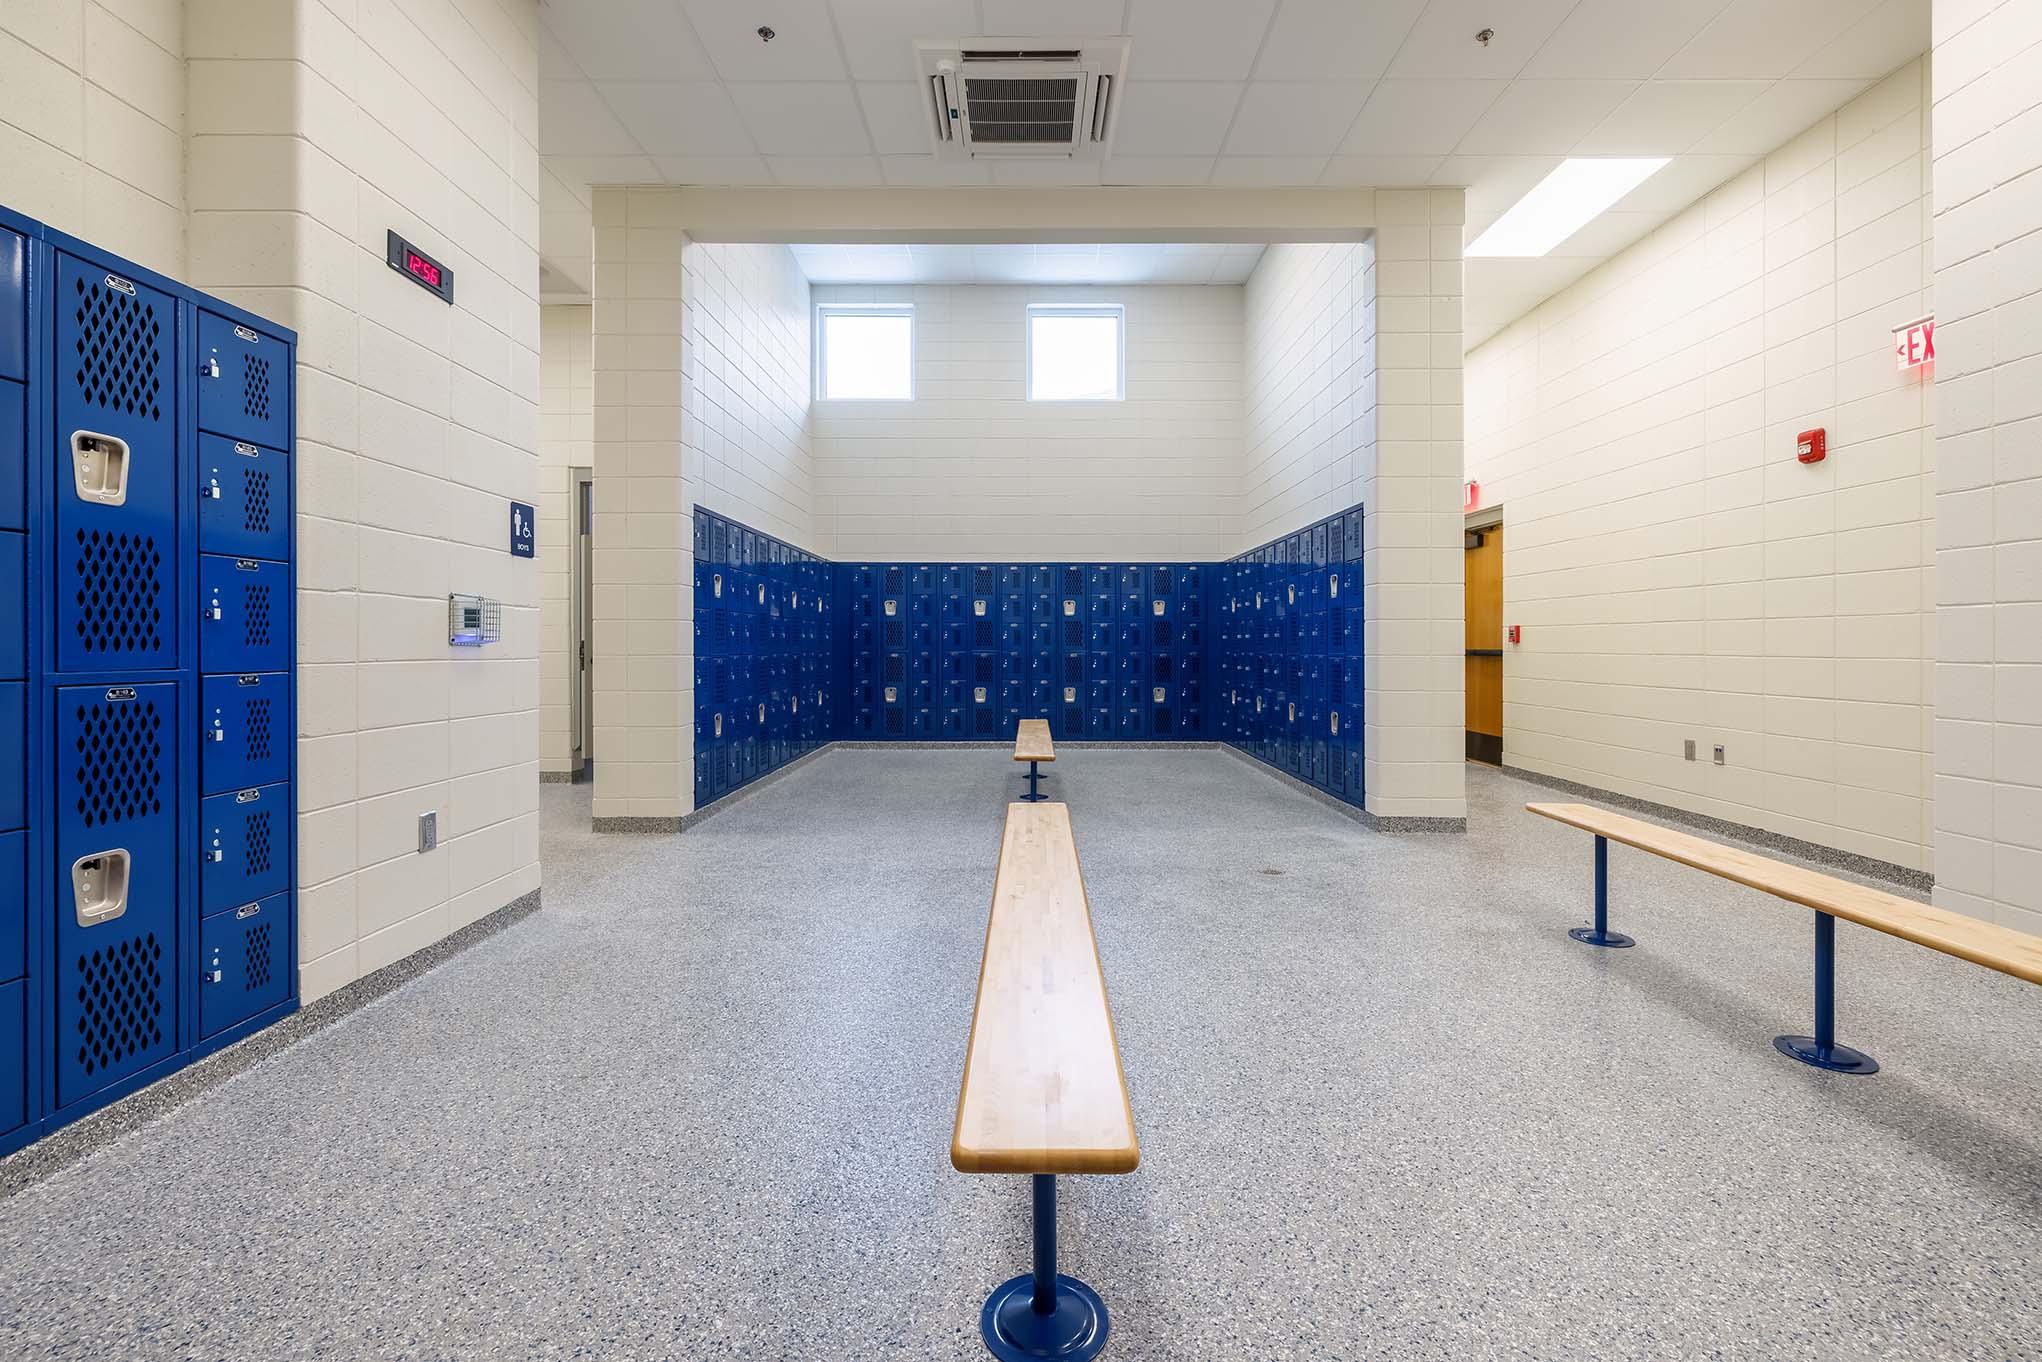 JB Pennington High School